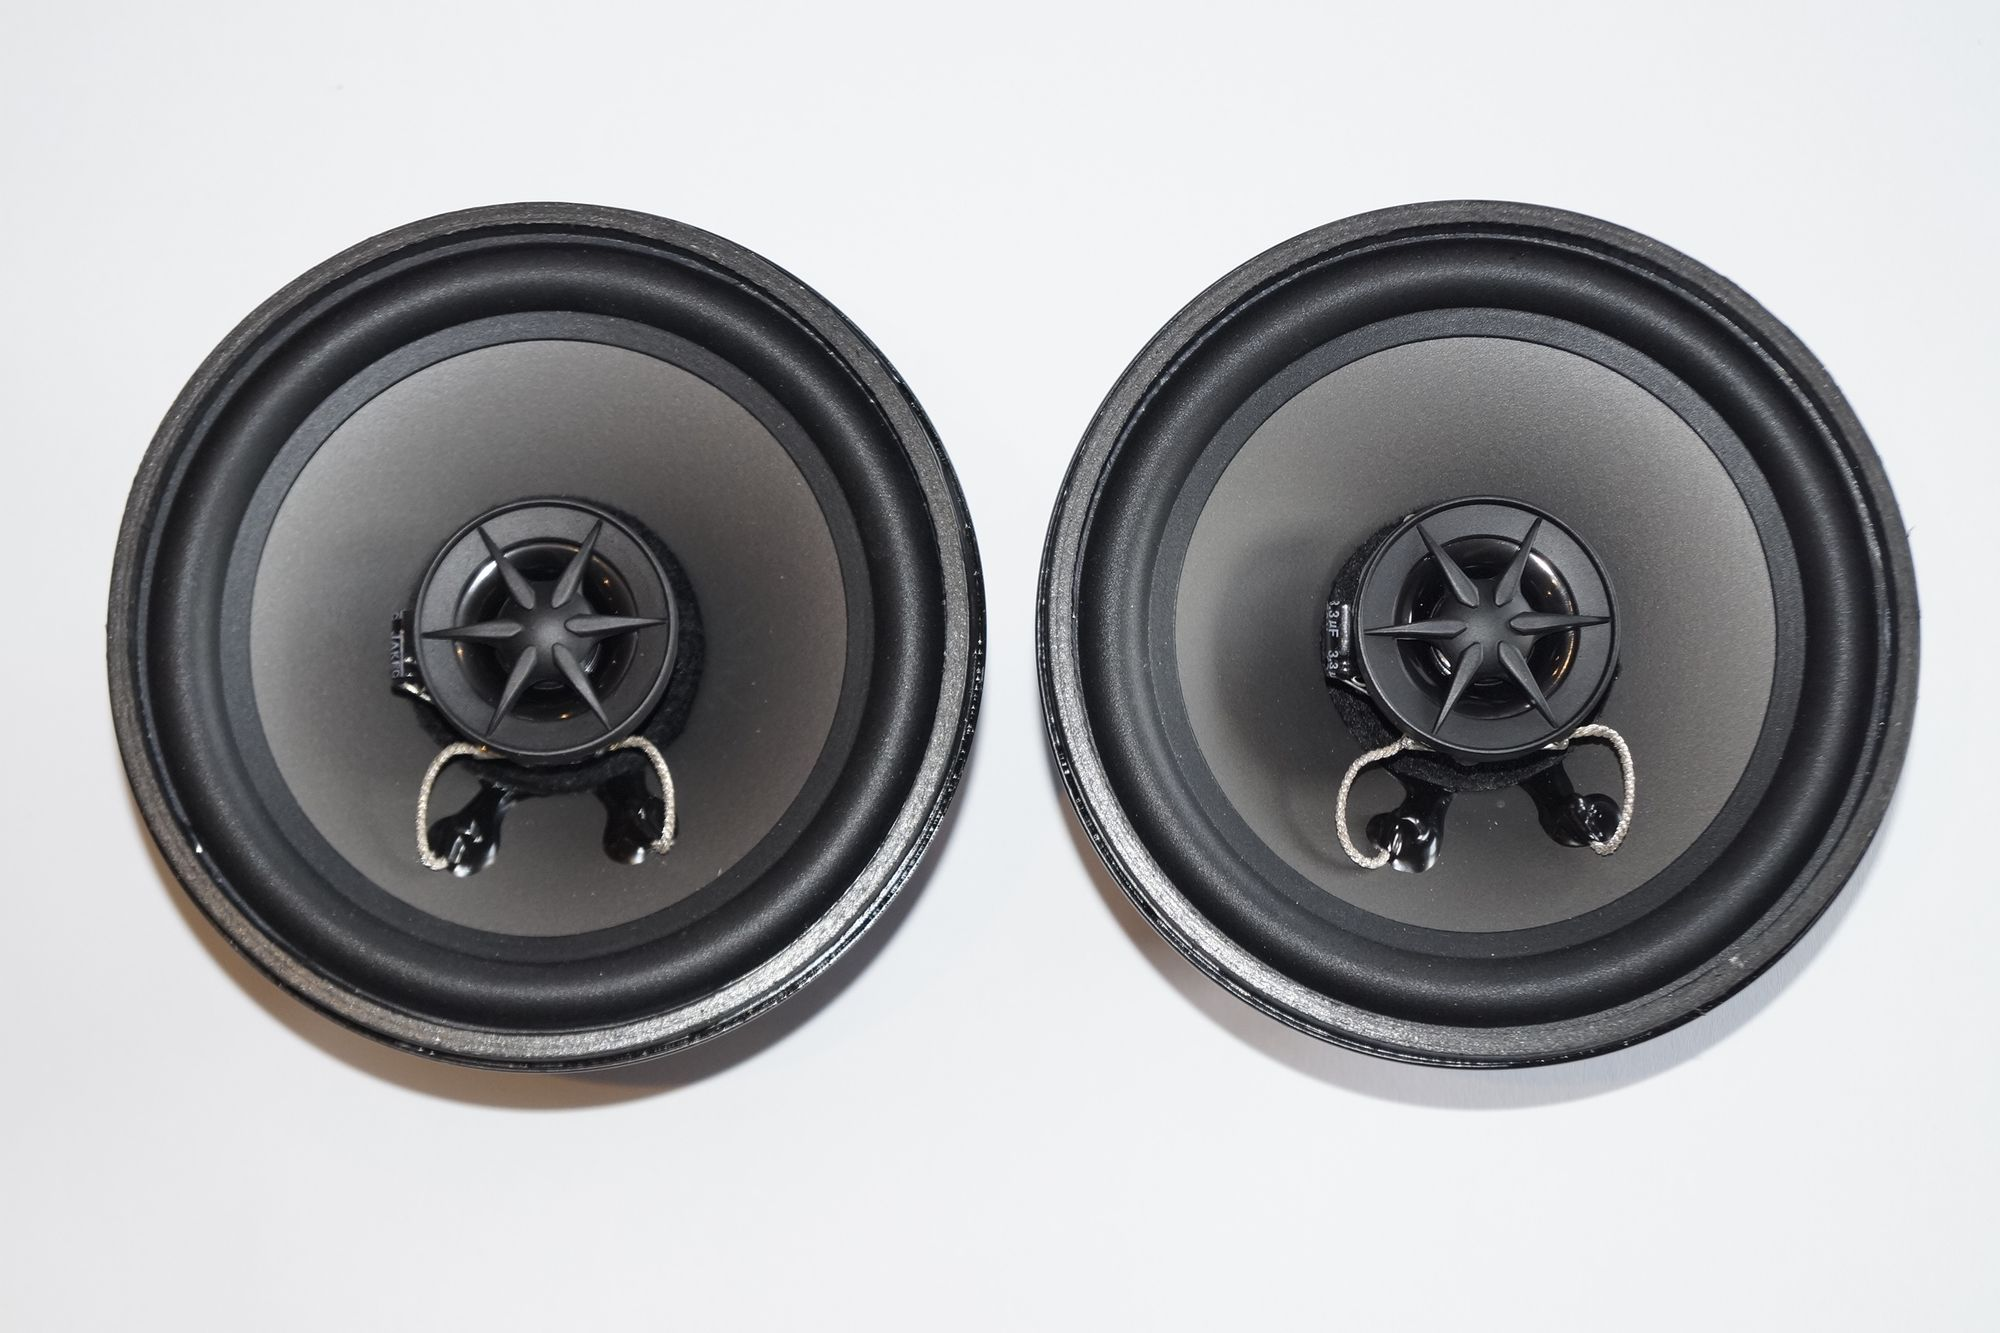 Mercedes Benz W 124 2 Wege Lautsprecher Front Armaturenbrett PG Audio 1 Paar  – Bild 1